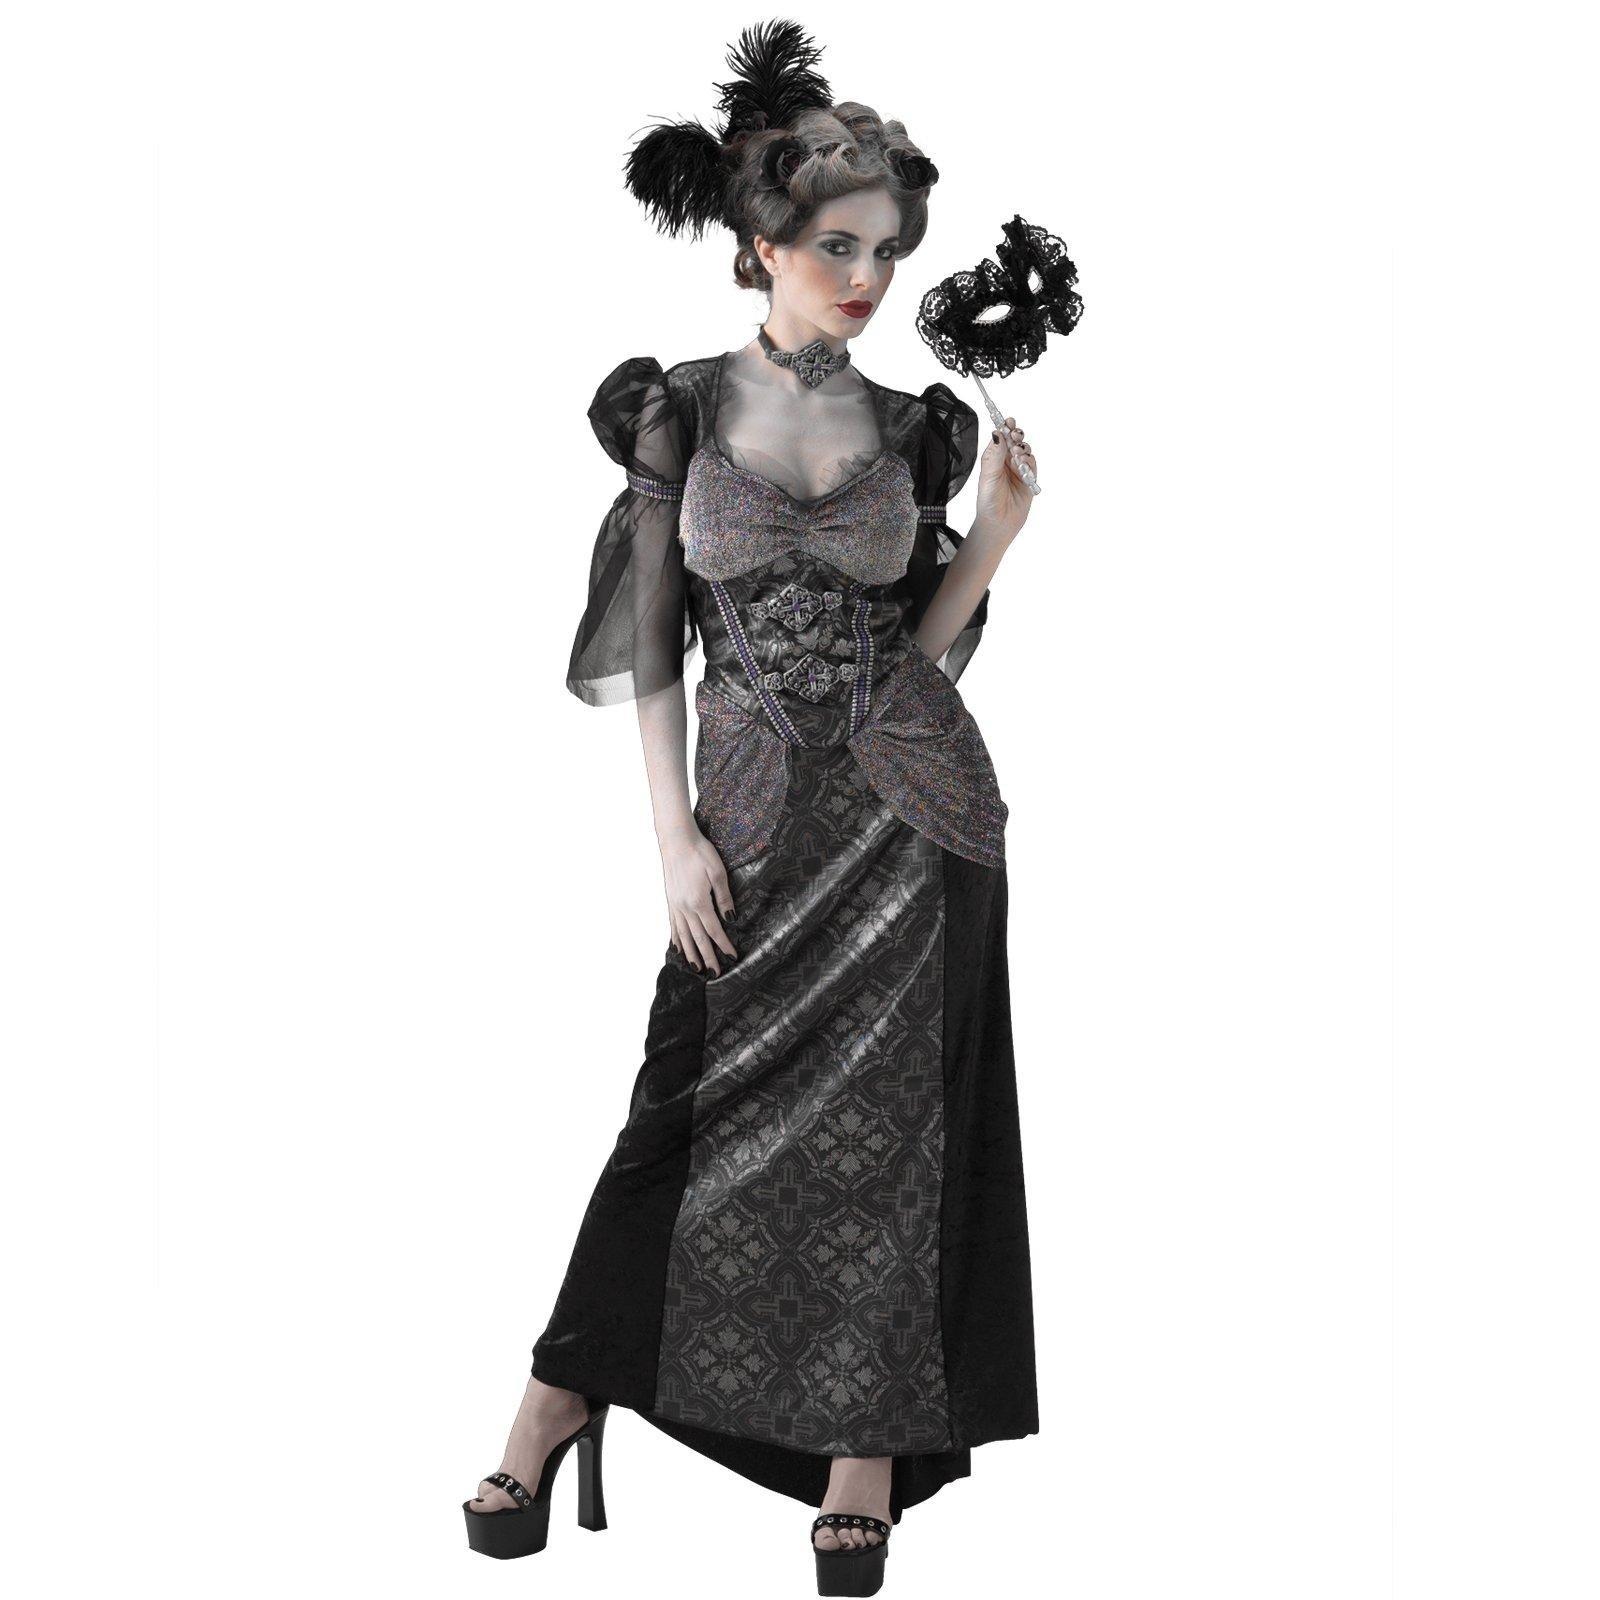 10 Fashionable Masquerade Outfit Ideas For Women cheap masquerade ball dresses criolla brithday wedding how to 2020